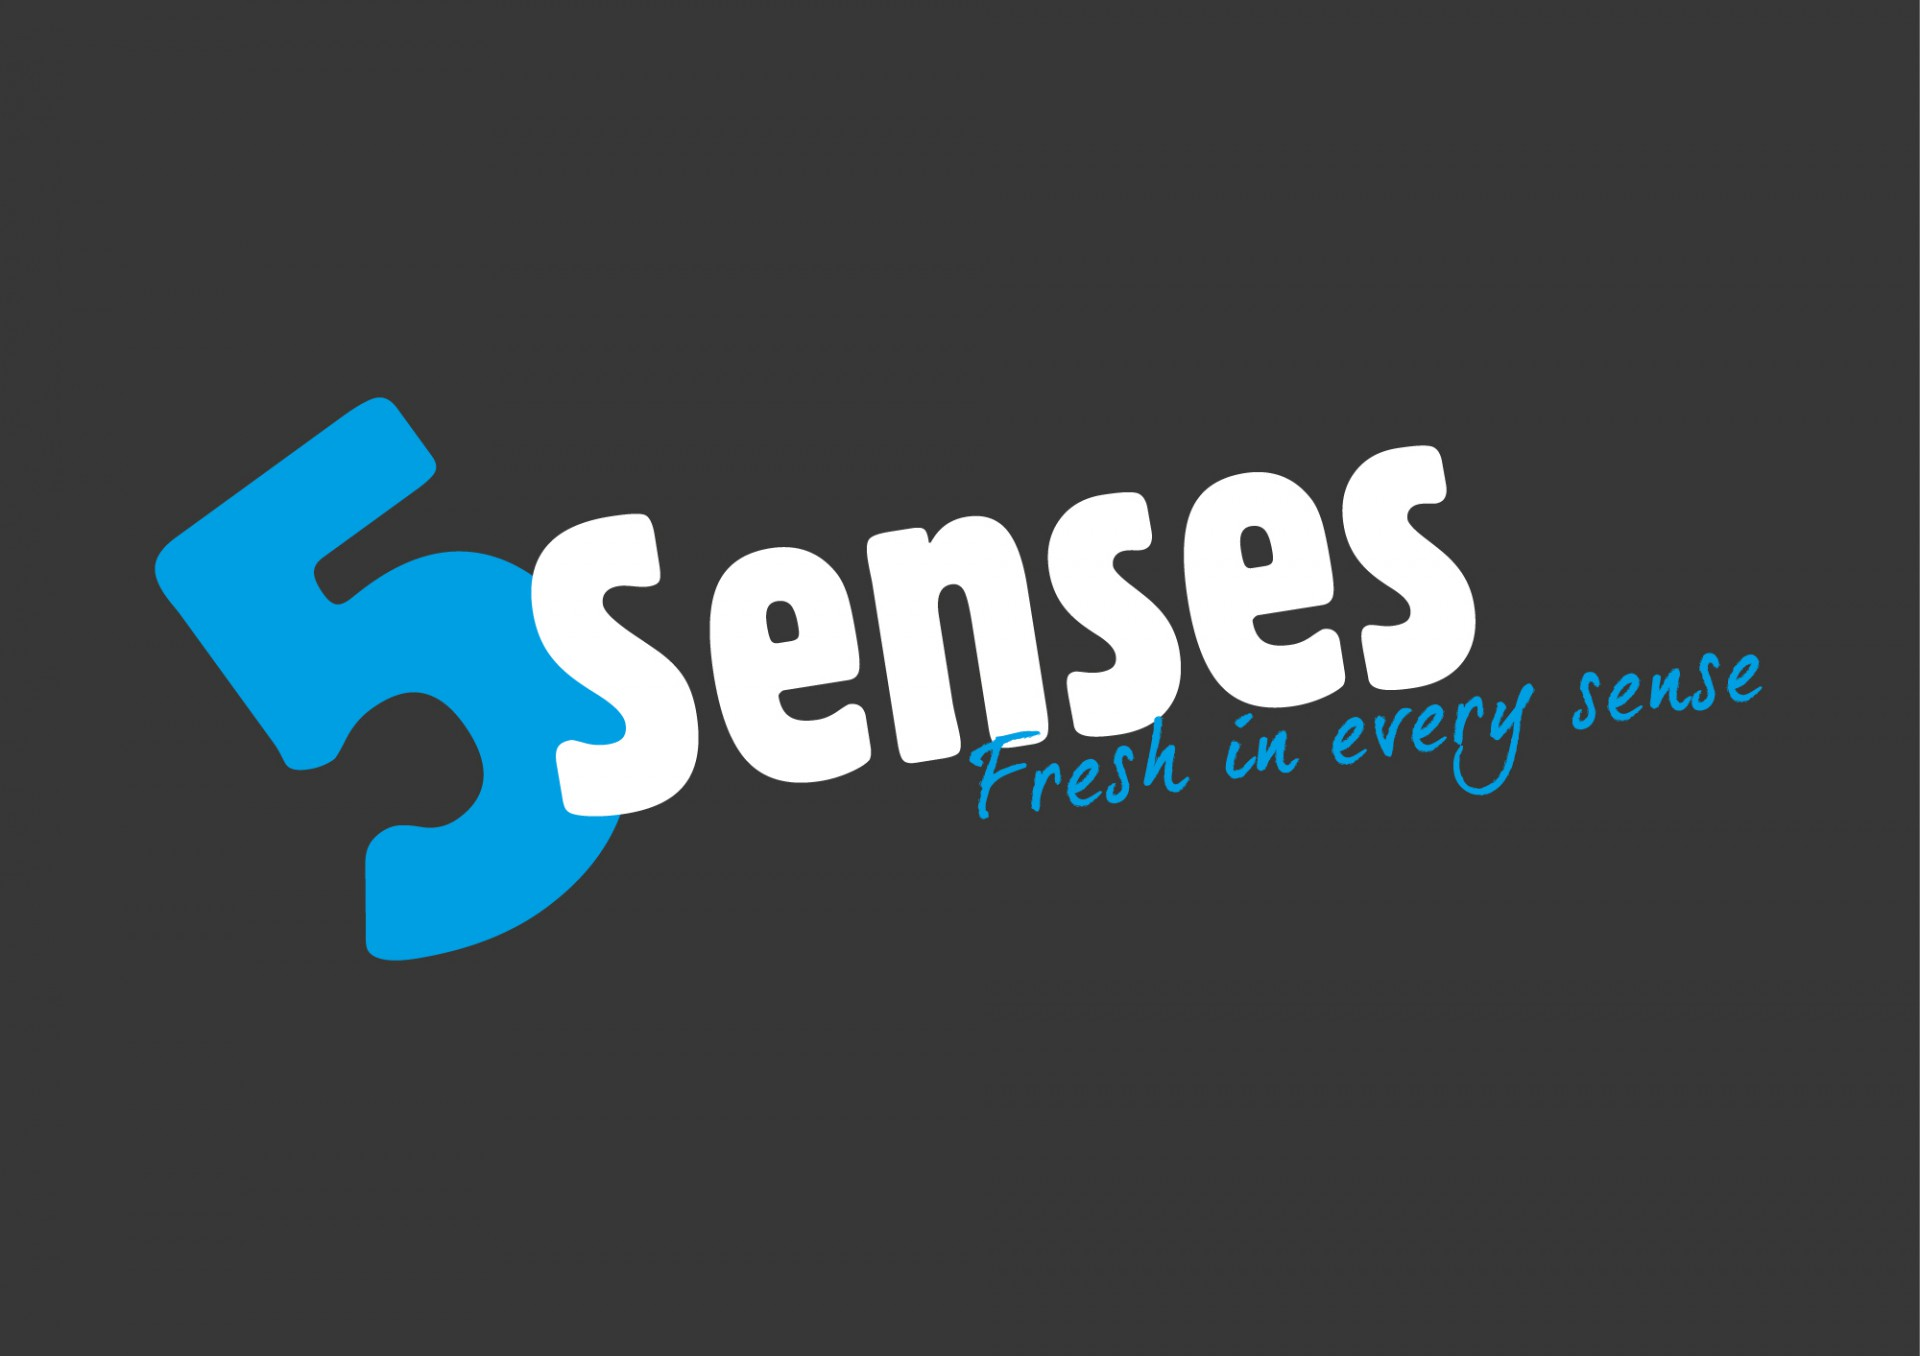 5 senses logo ERP